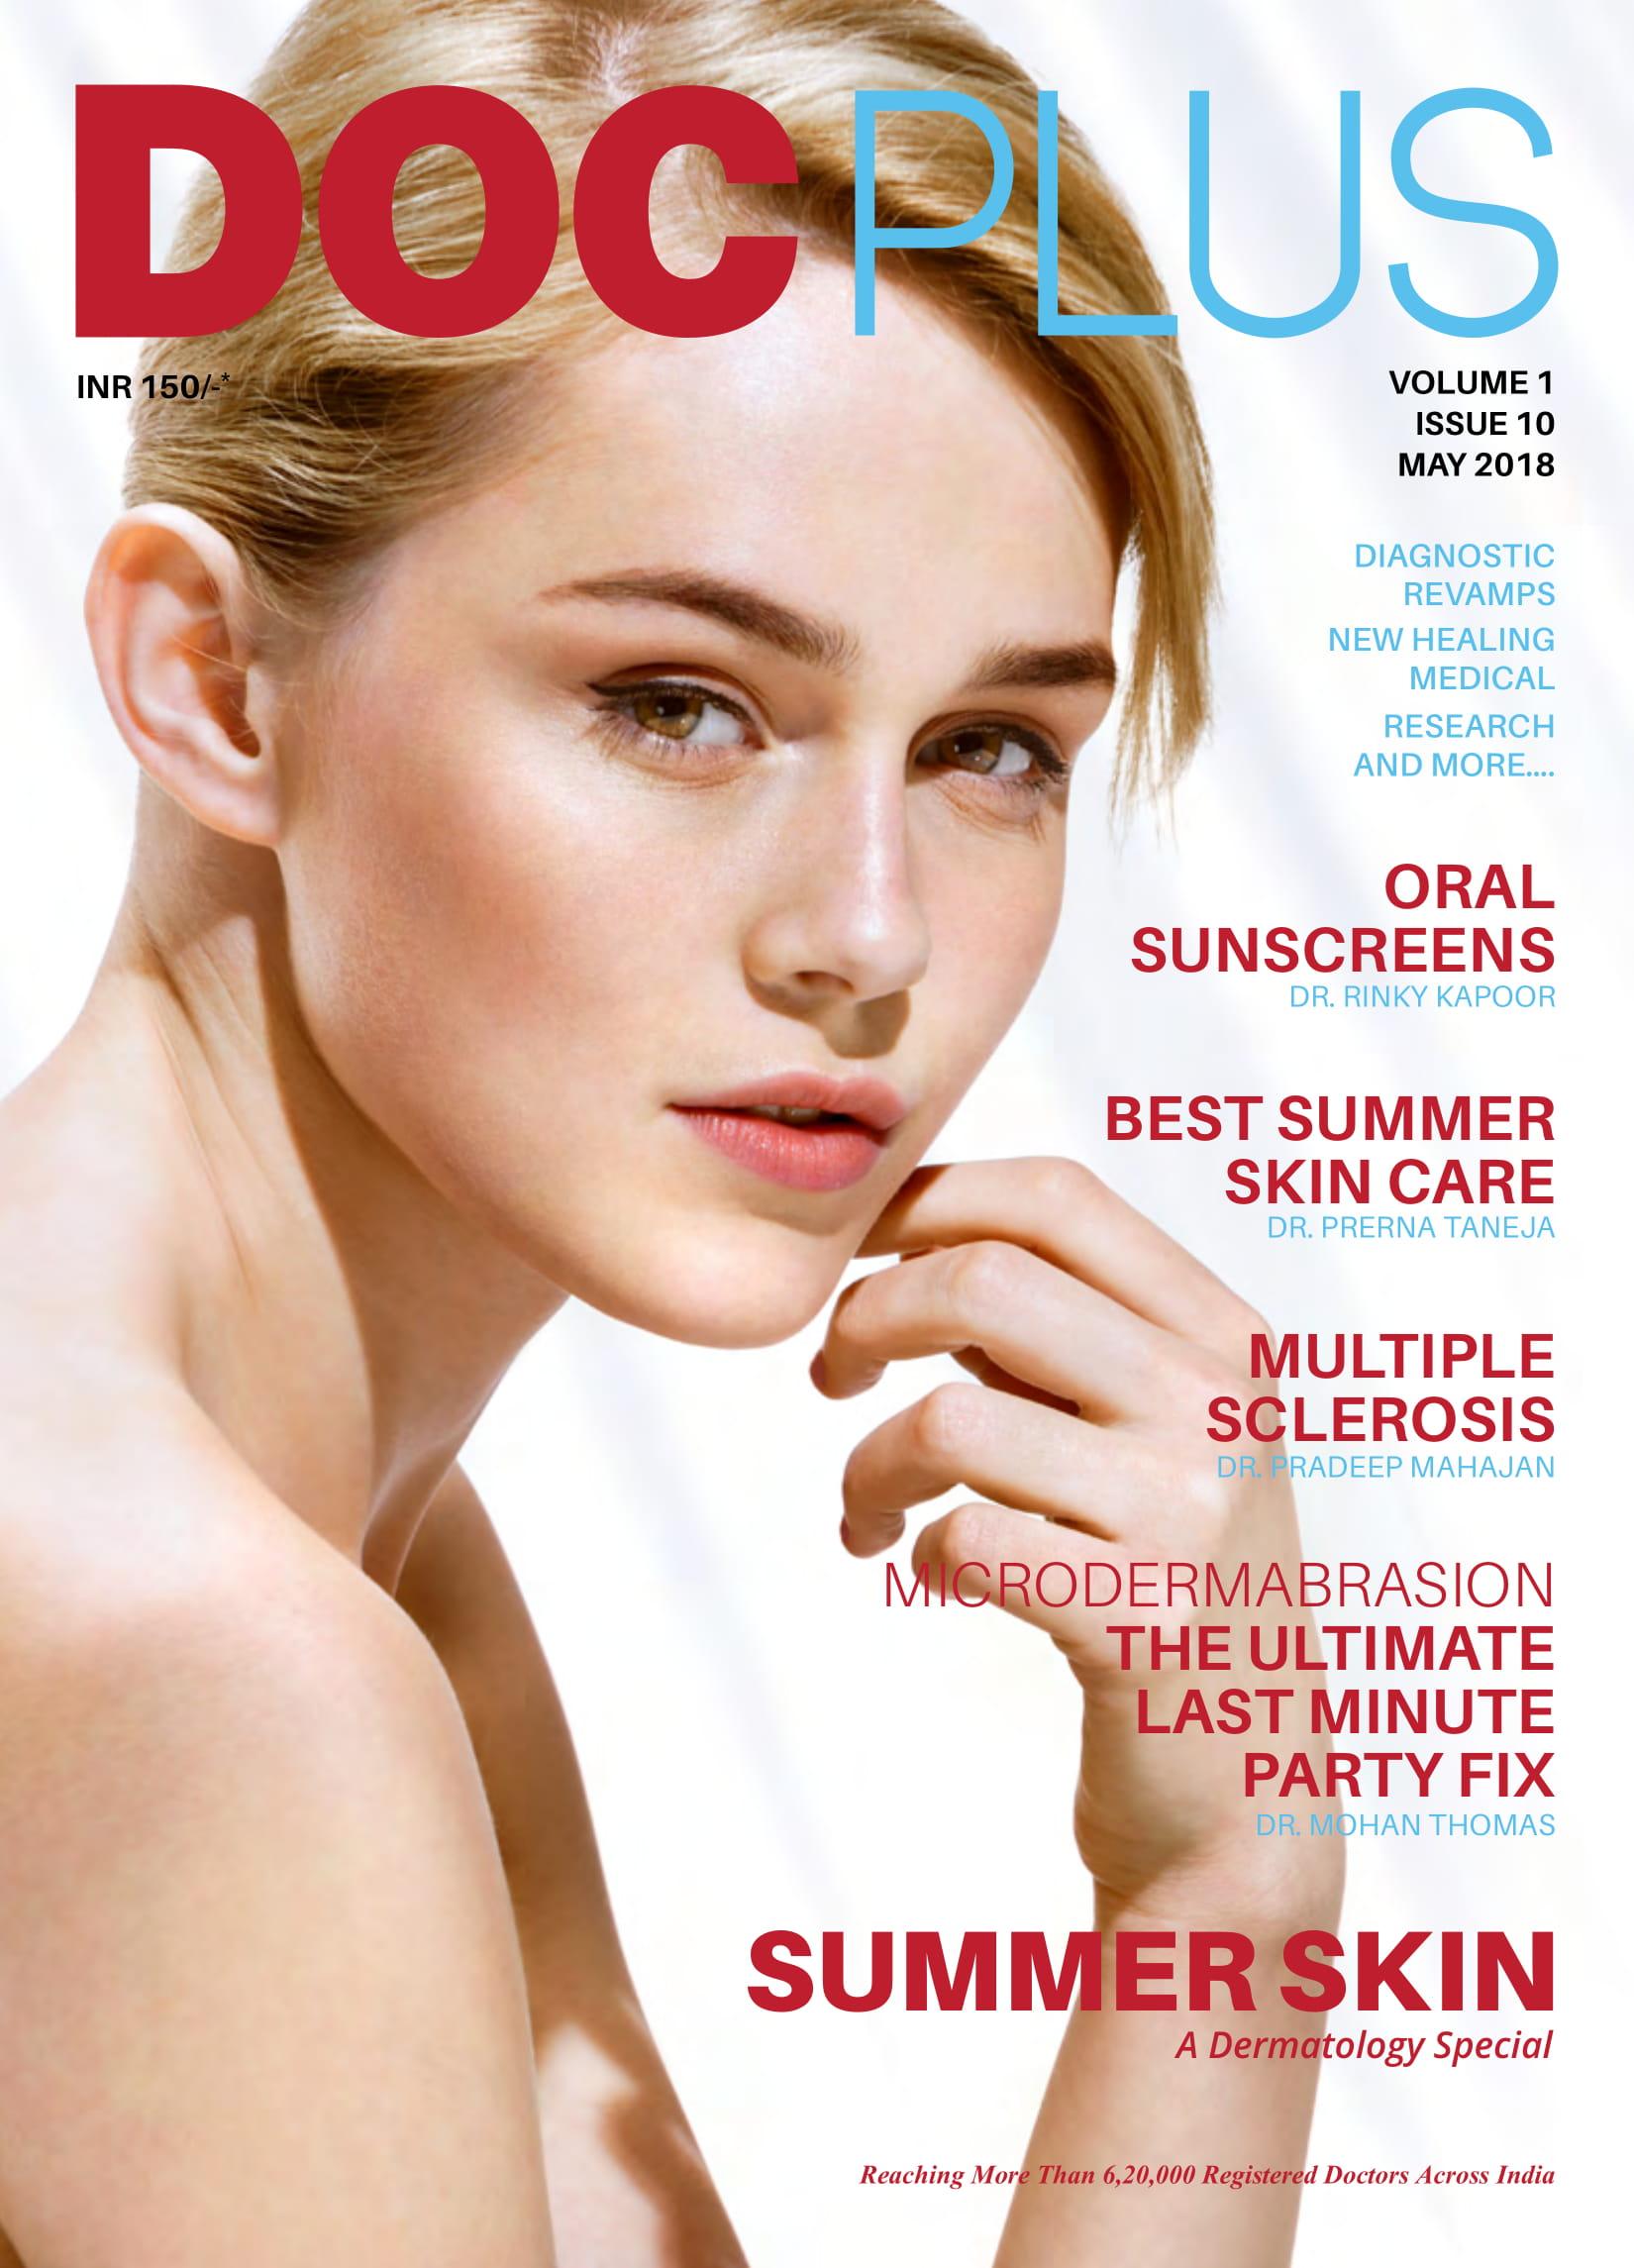 Oral Sunscreens